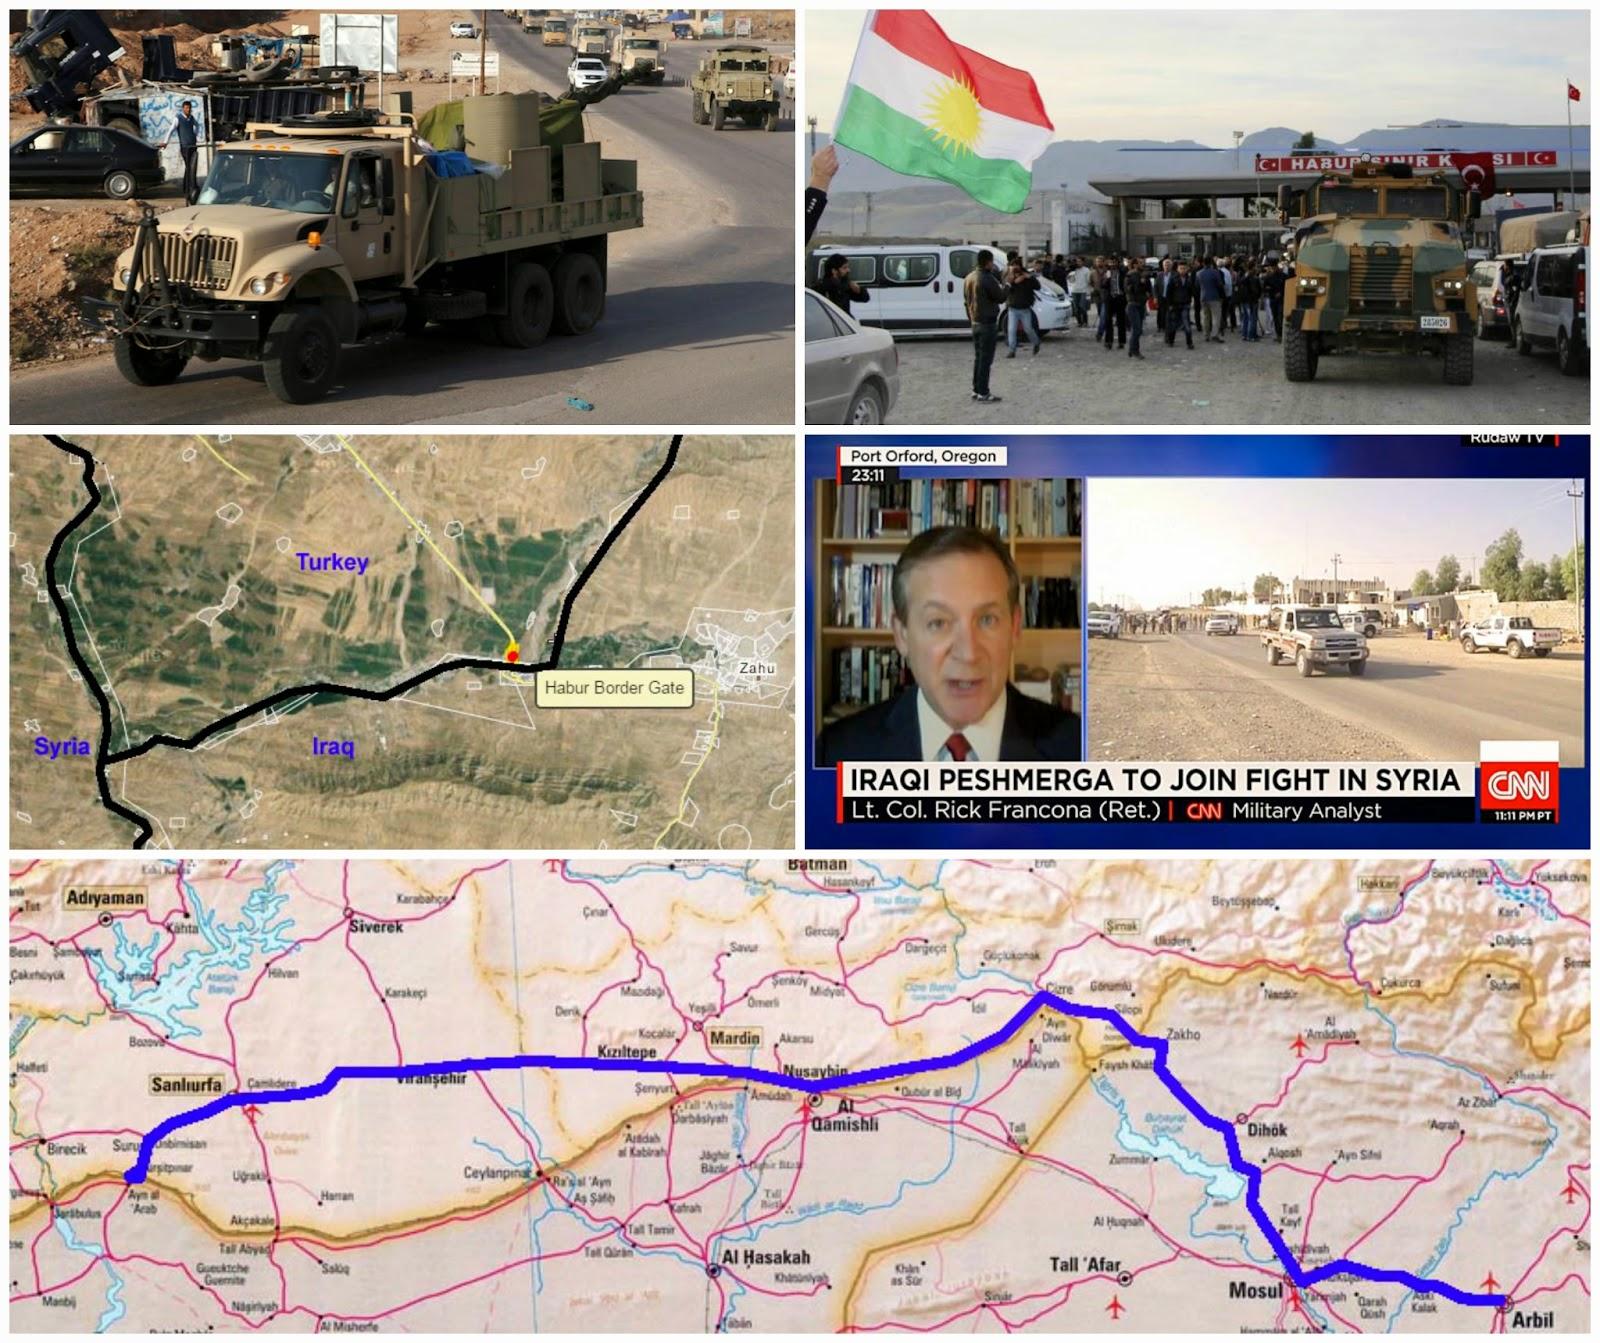 iraqi peshmerga troops cross turkey to kobani why and will it matter